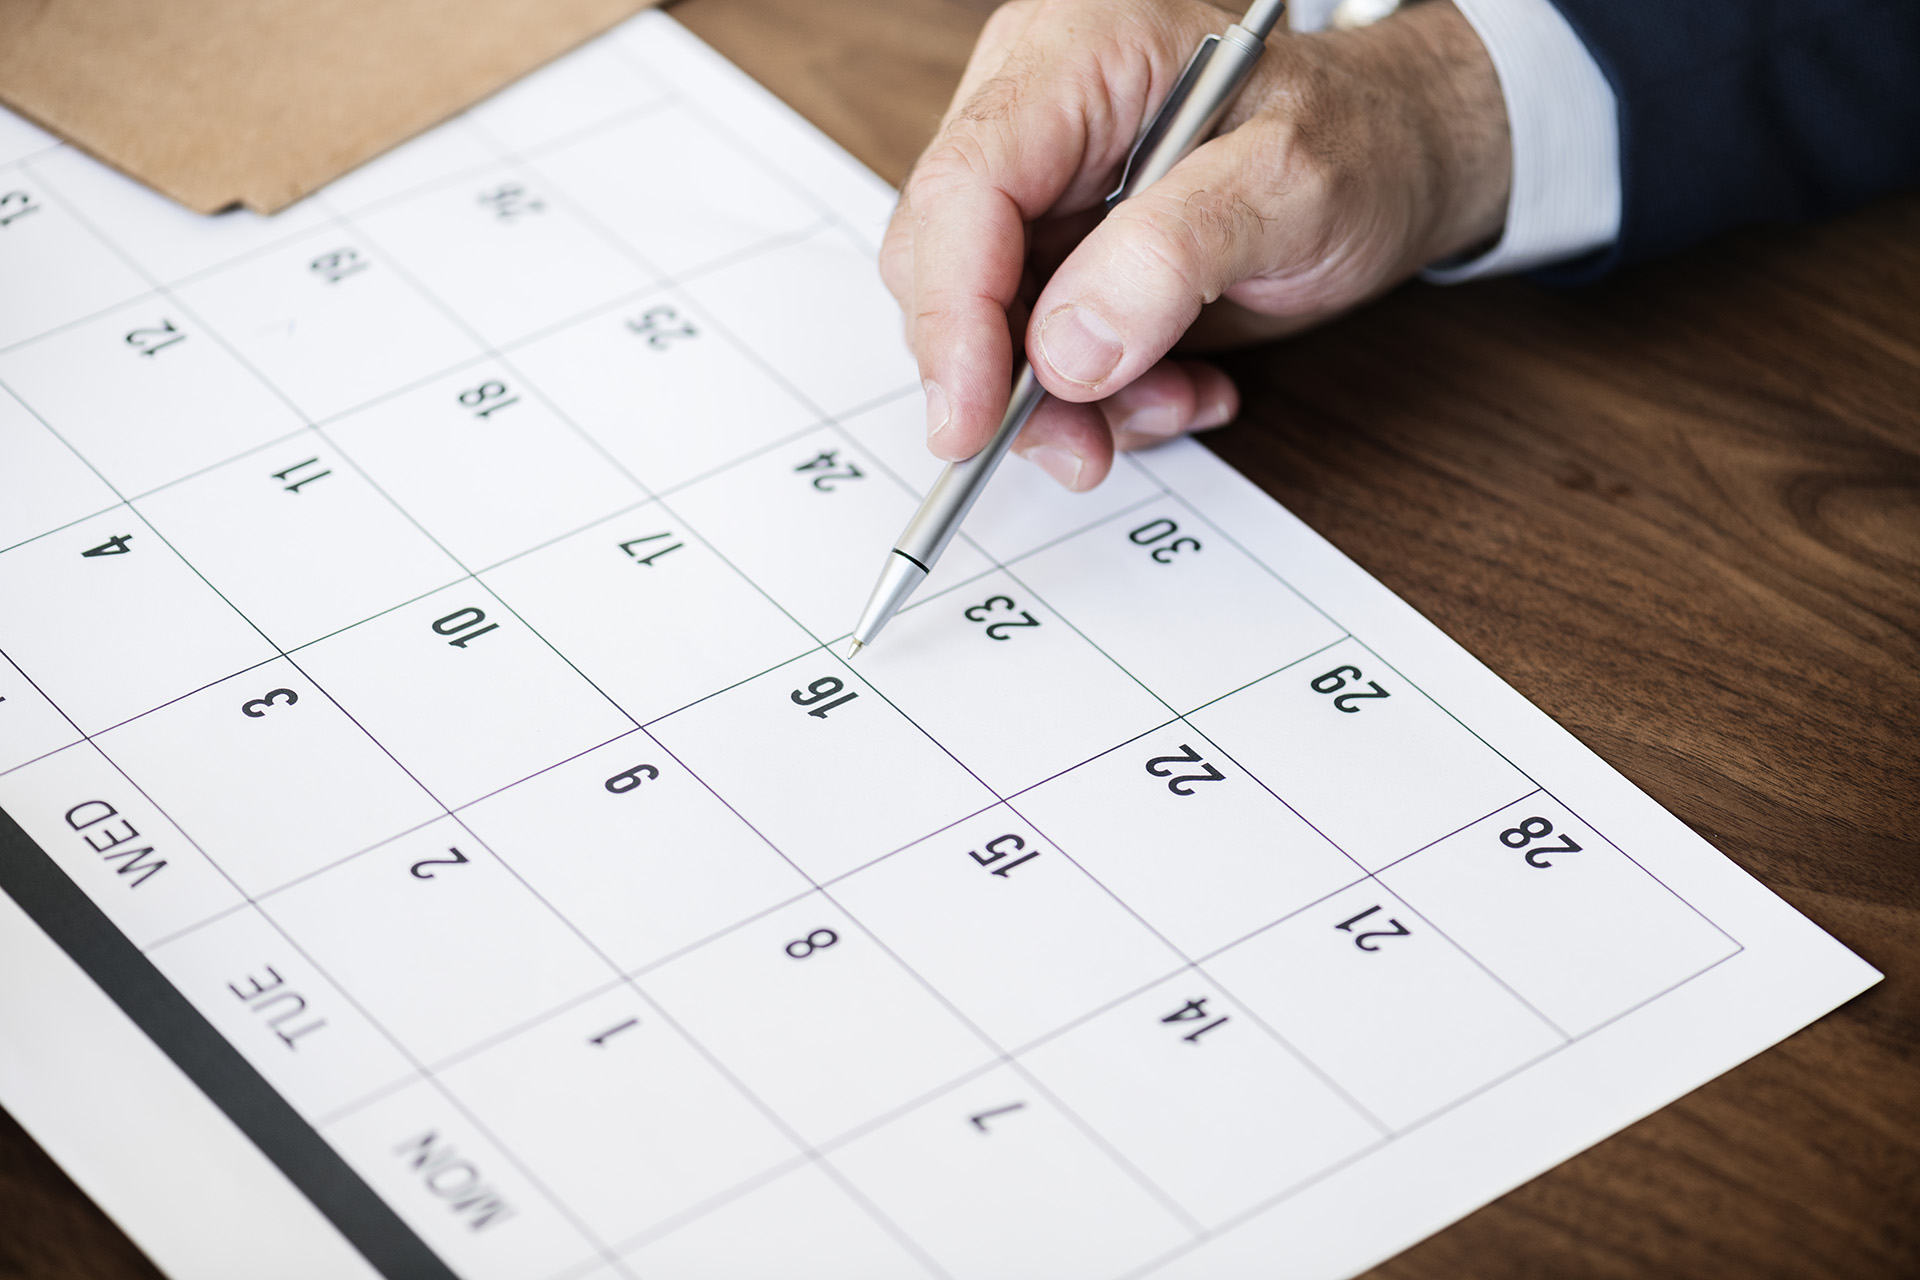 Календарь на PHP и Ajax